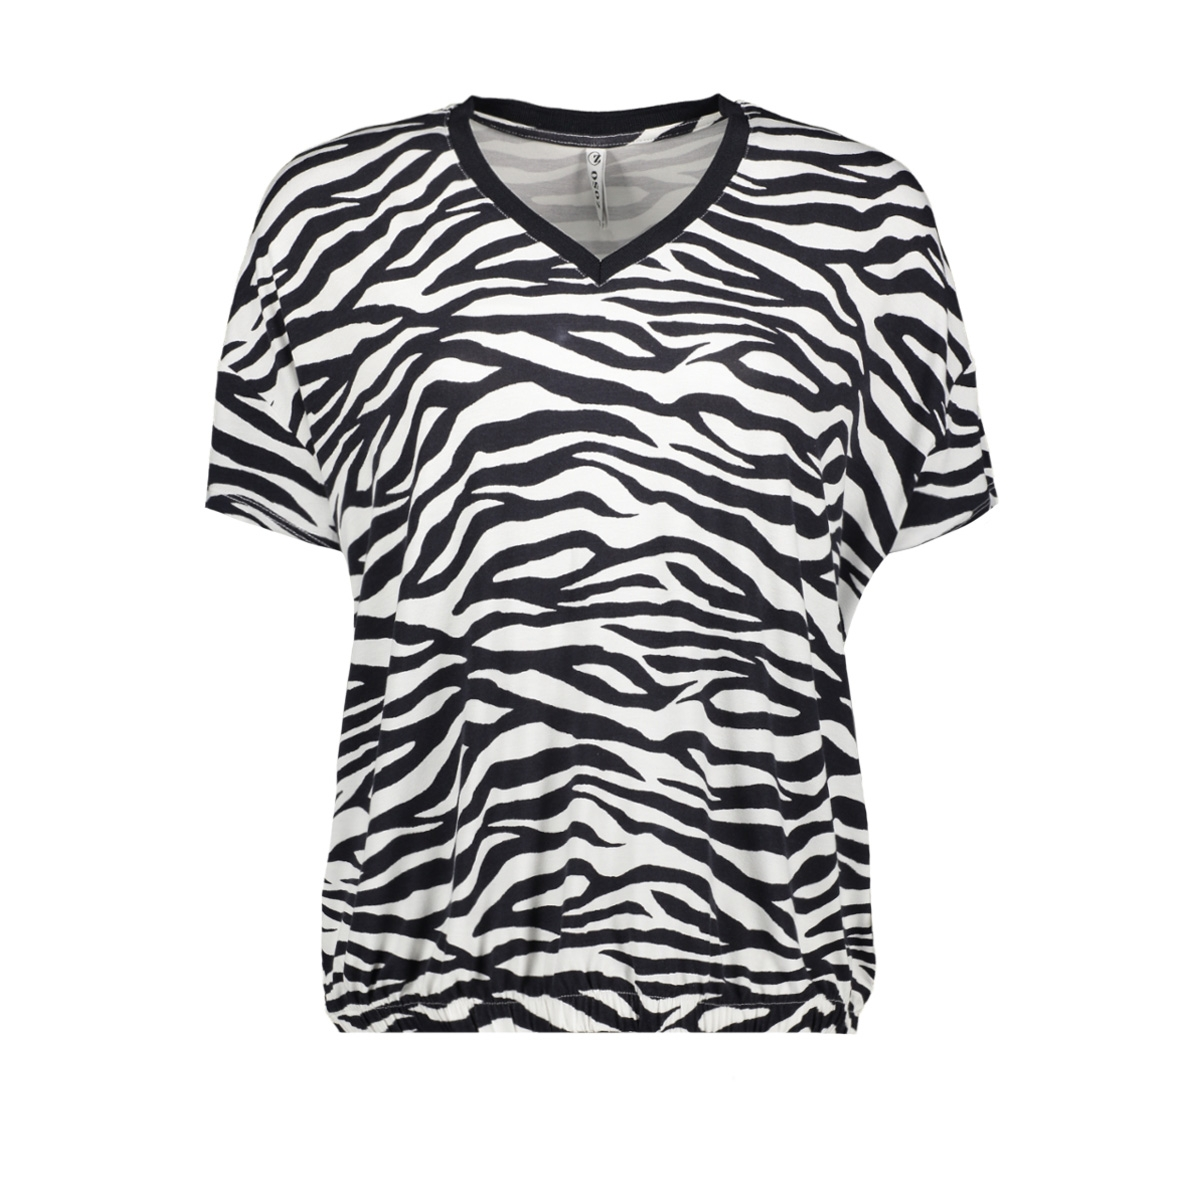 ay1910 zoso t-shirt offwhite/navy